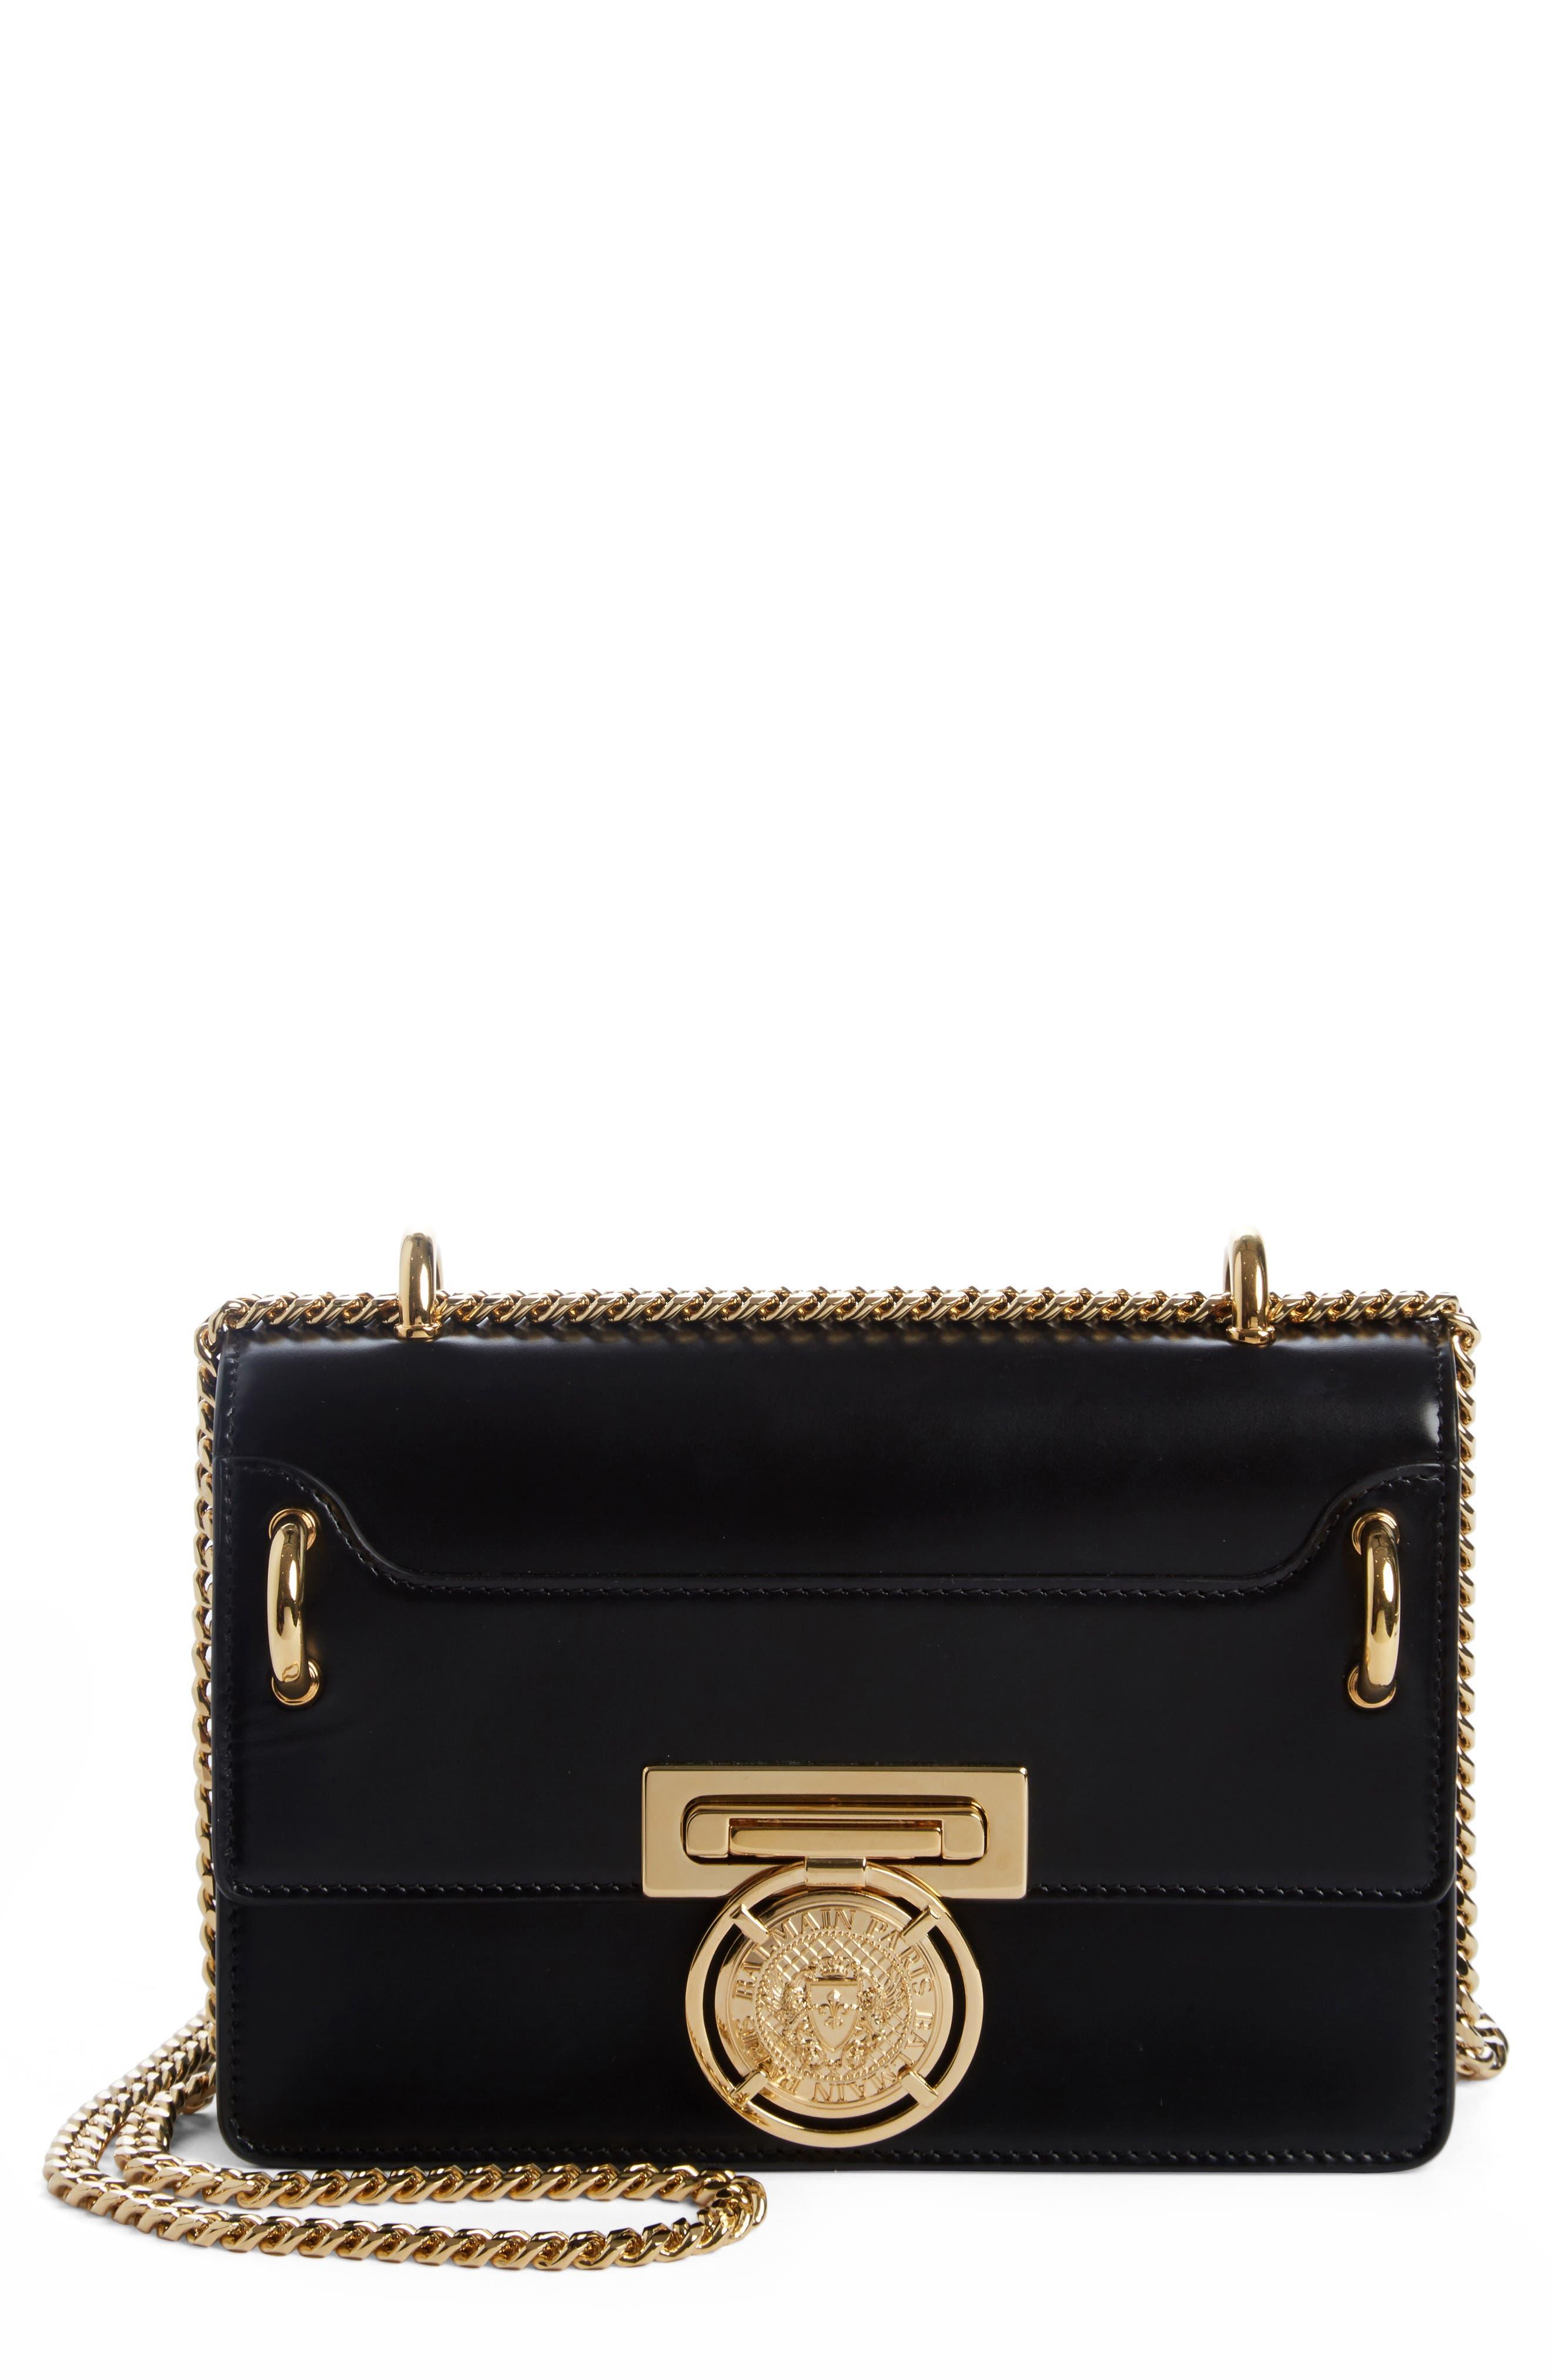 b3463e2b7b1 Balmain Glace Leather Box Shoulder Bag - Black | ModeSens